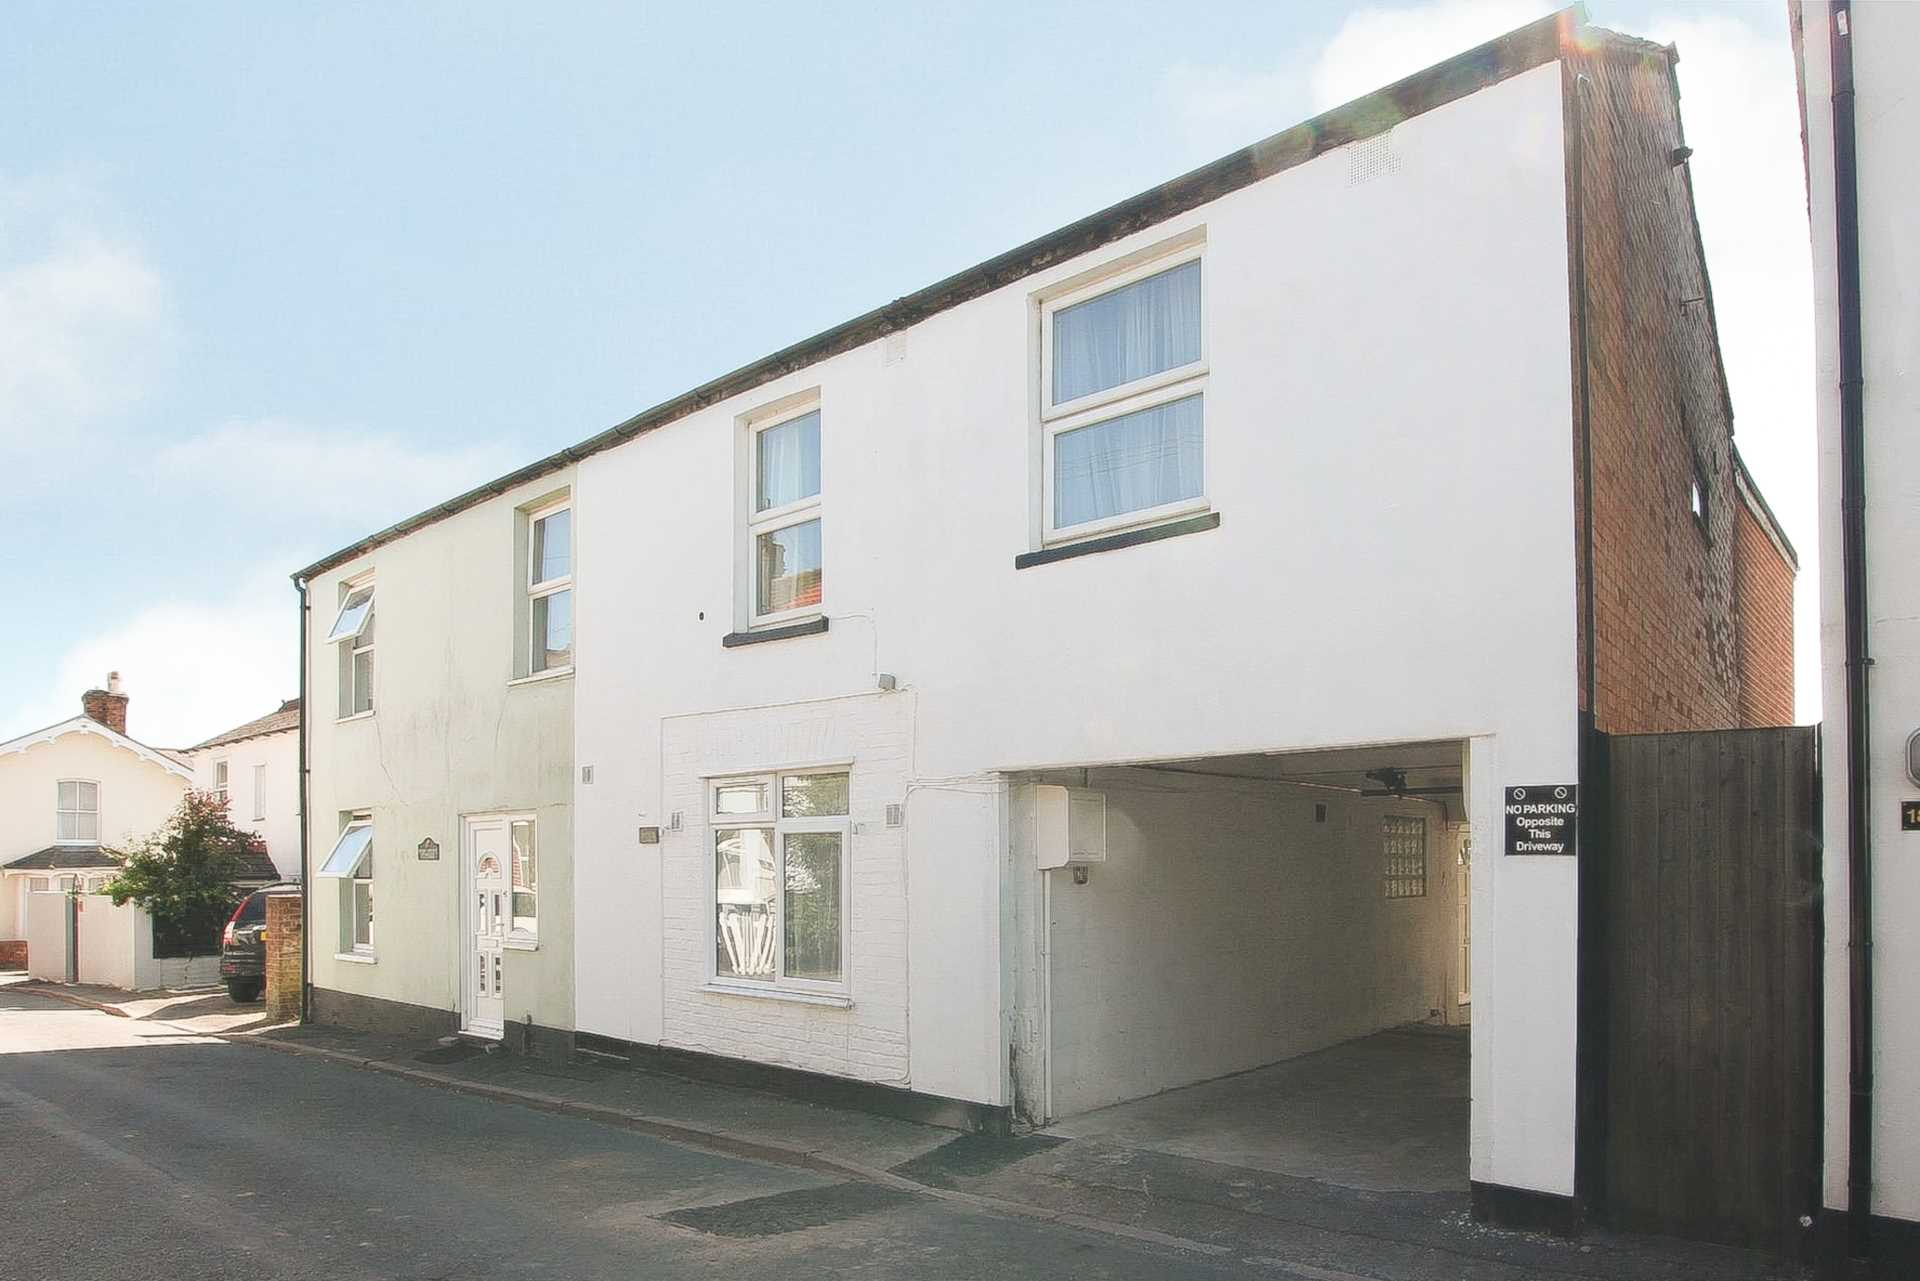 1 bed flat for sale in Albert Street, Blandford Forum, Blandford Forum 0